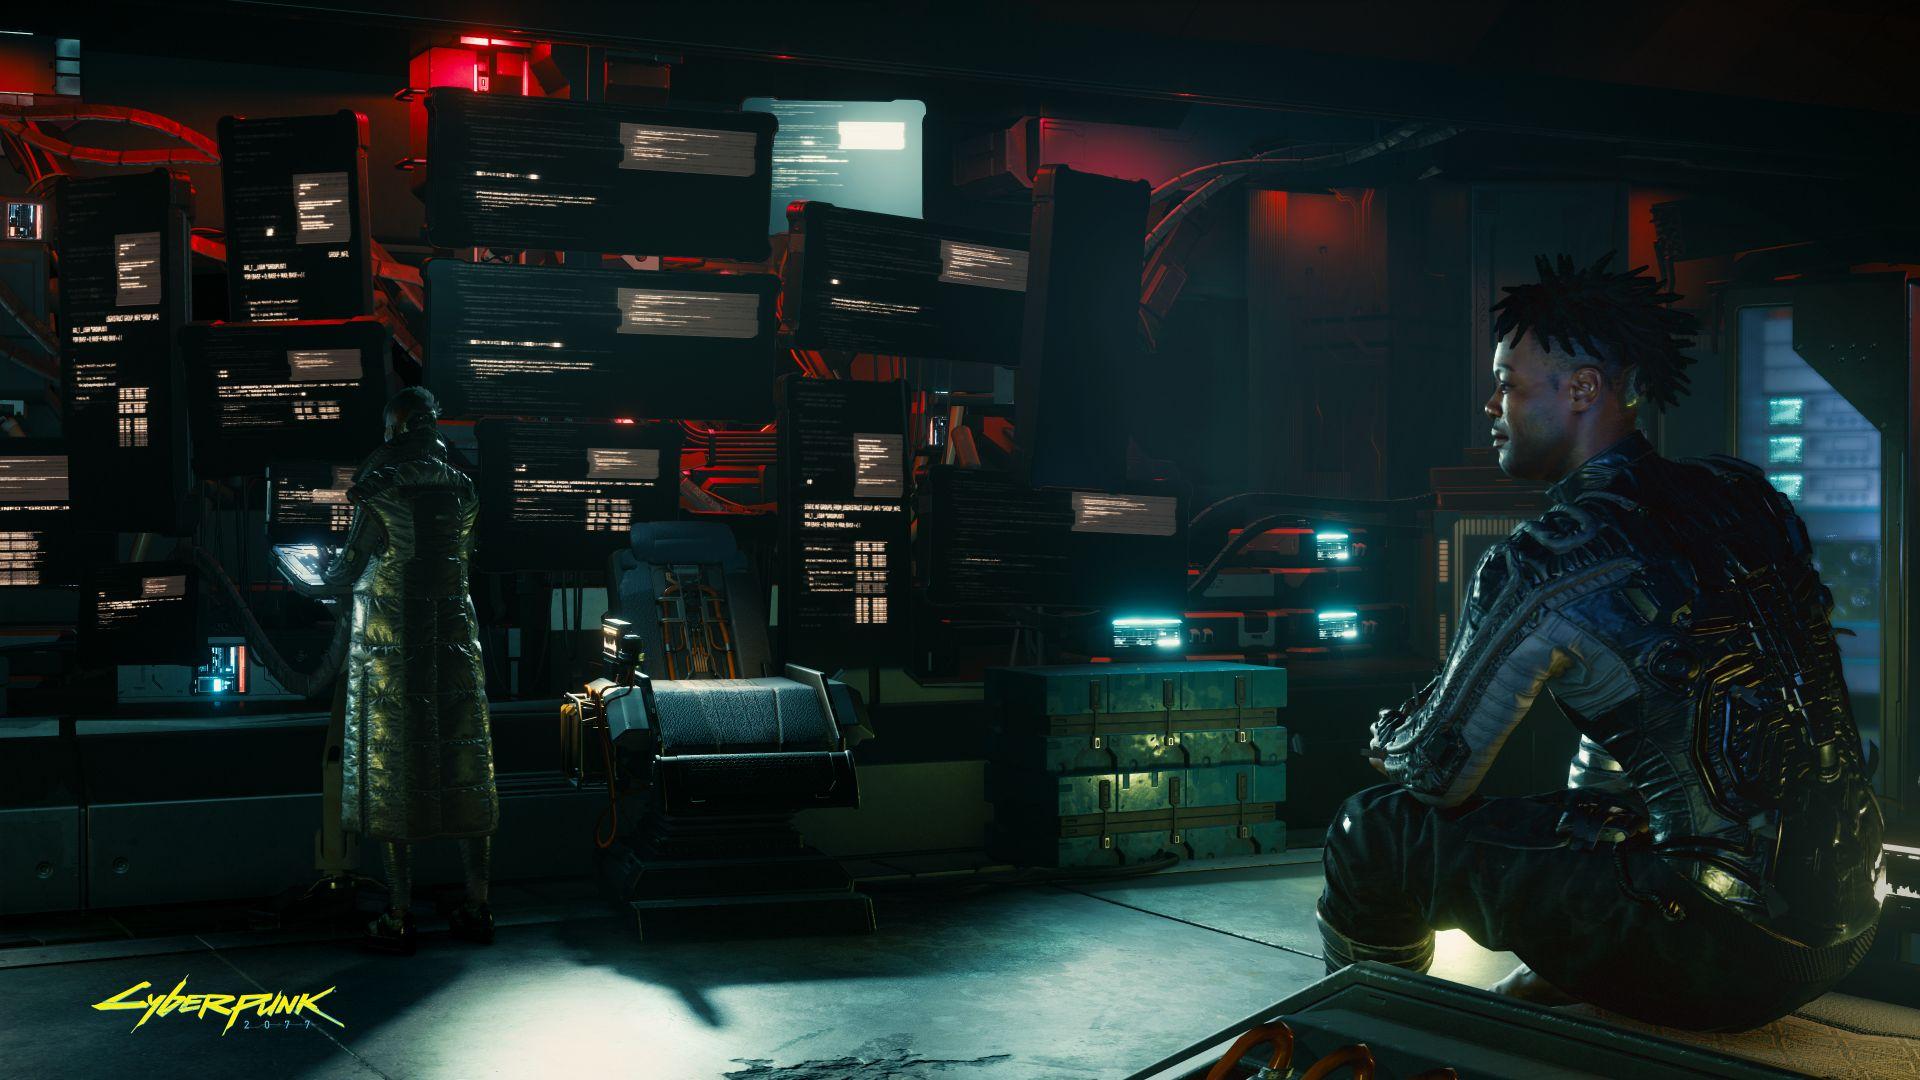 Cyberpunk 2077 Ready to dive back